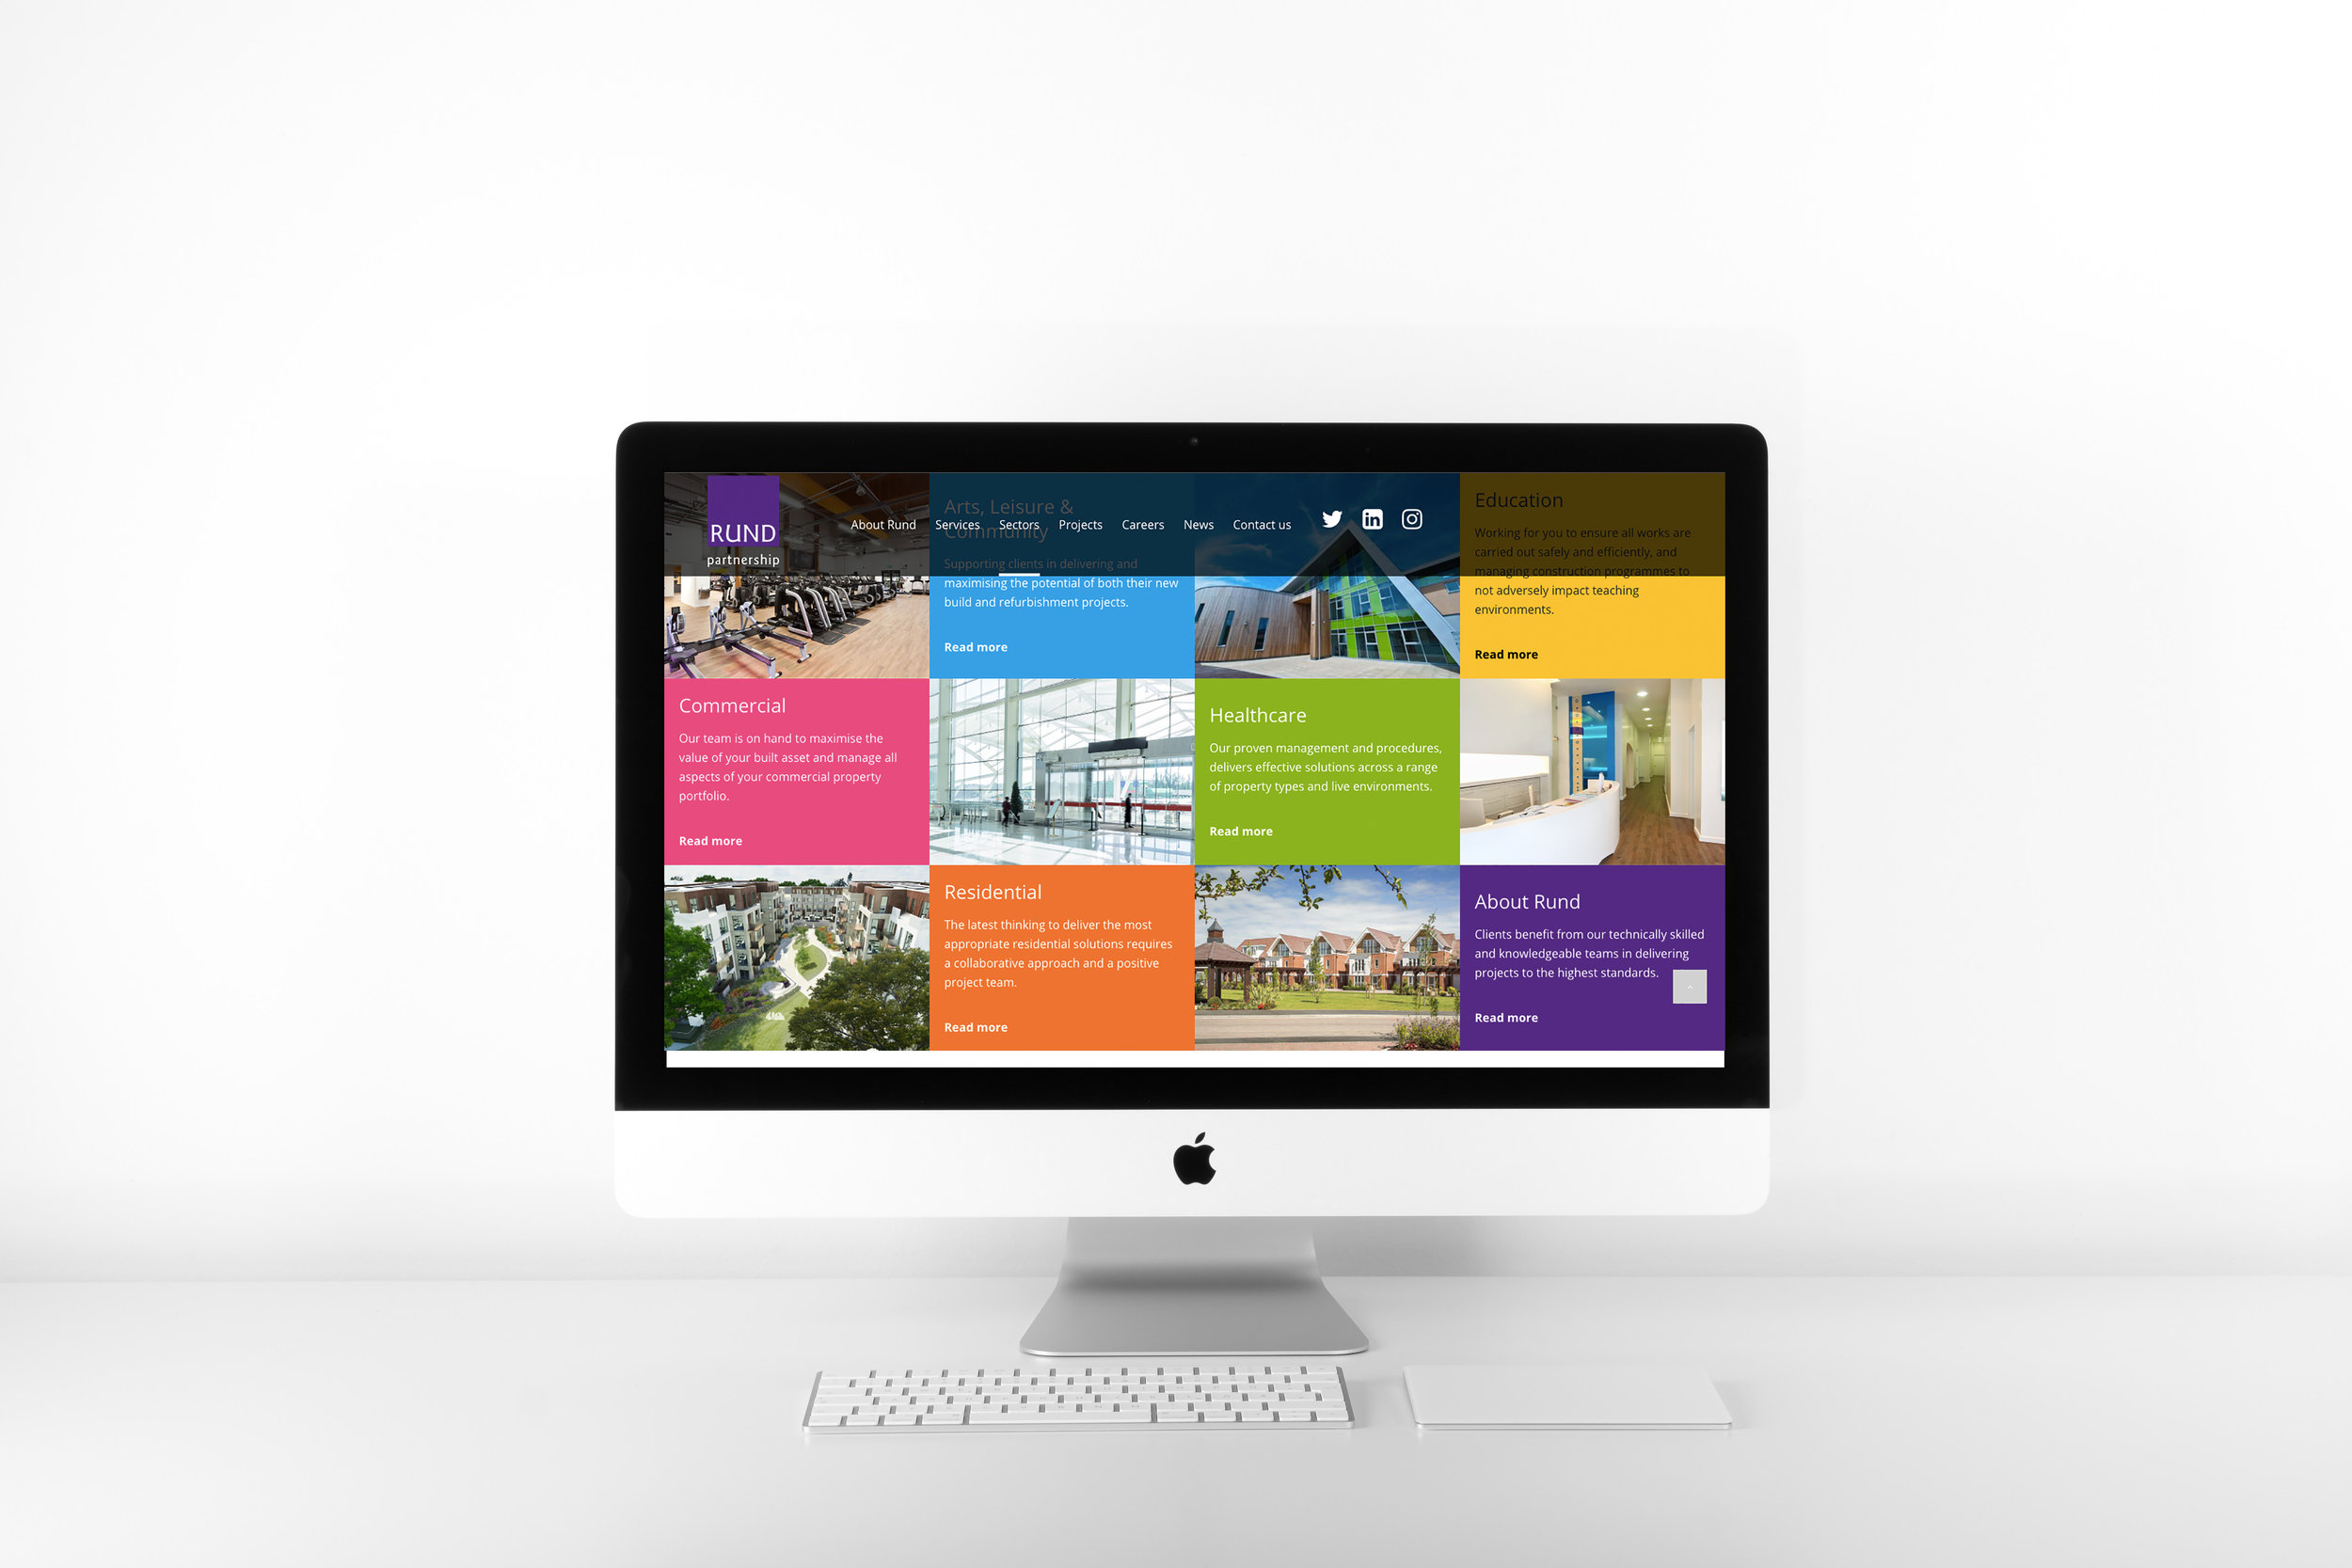 rund-partnership-new-website-sectors-page.jpg